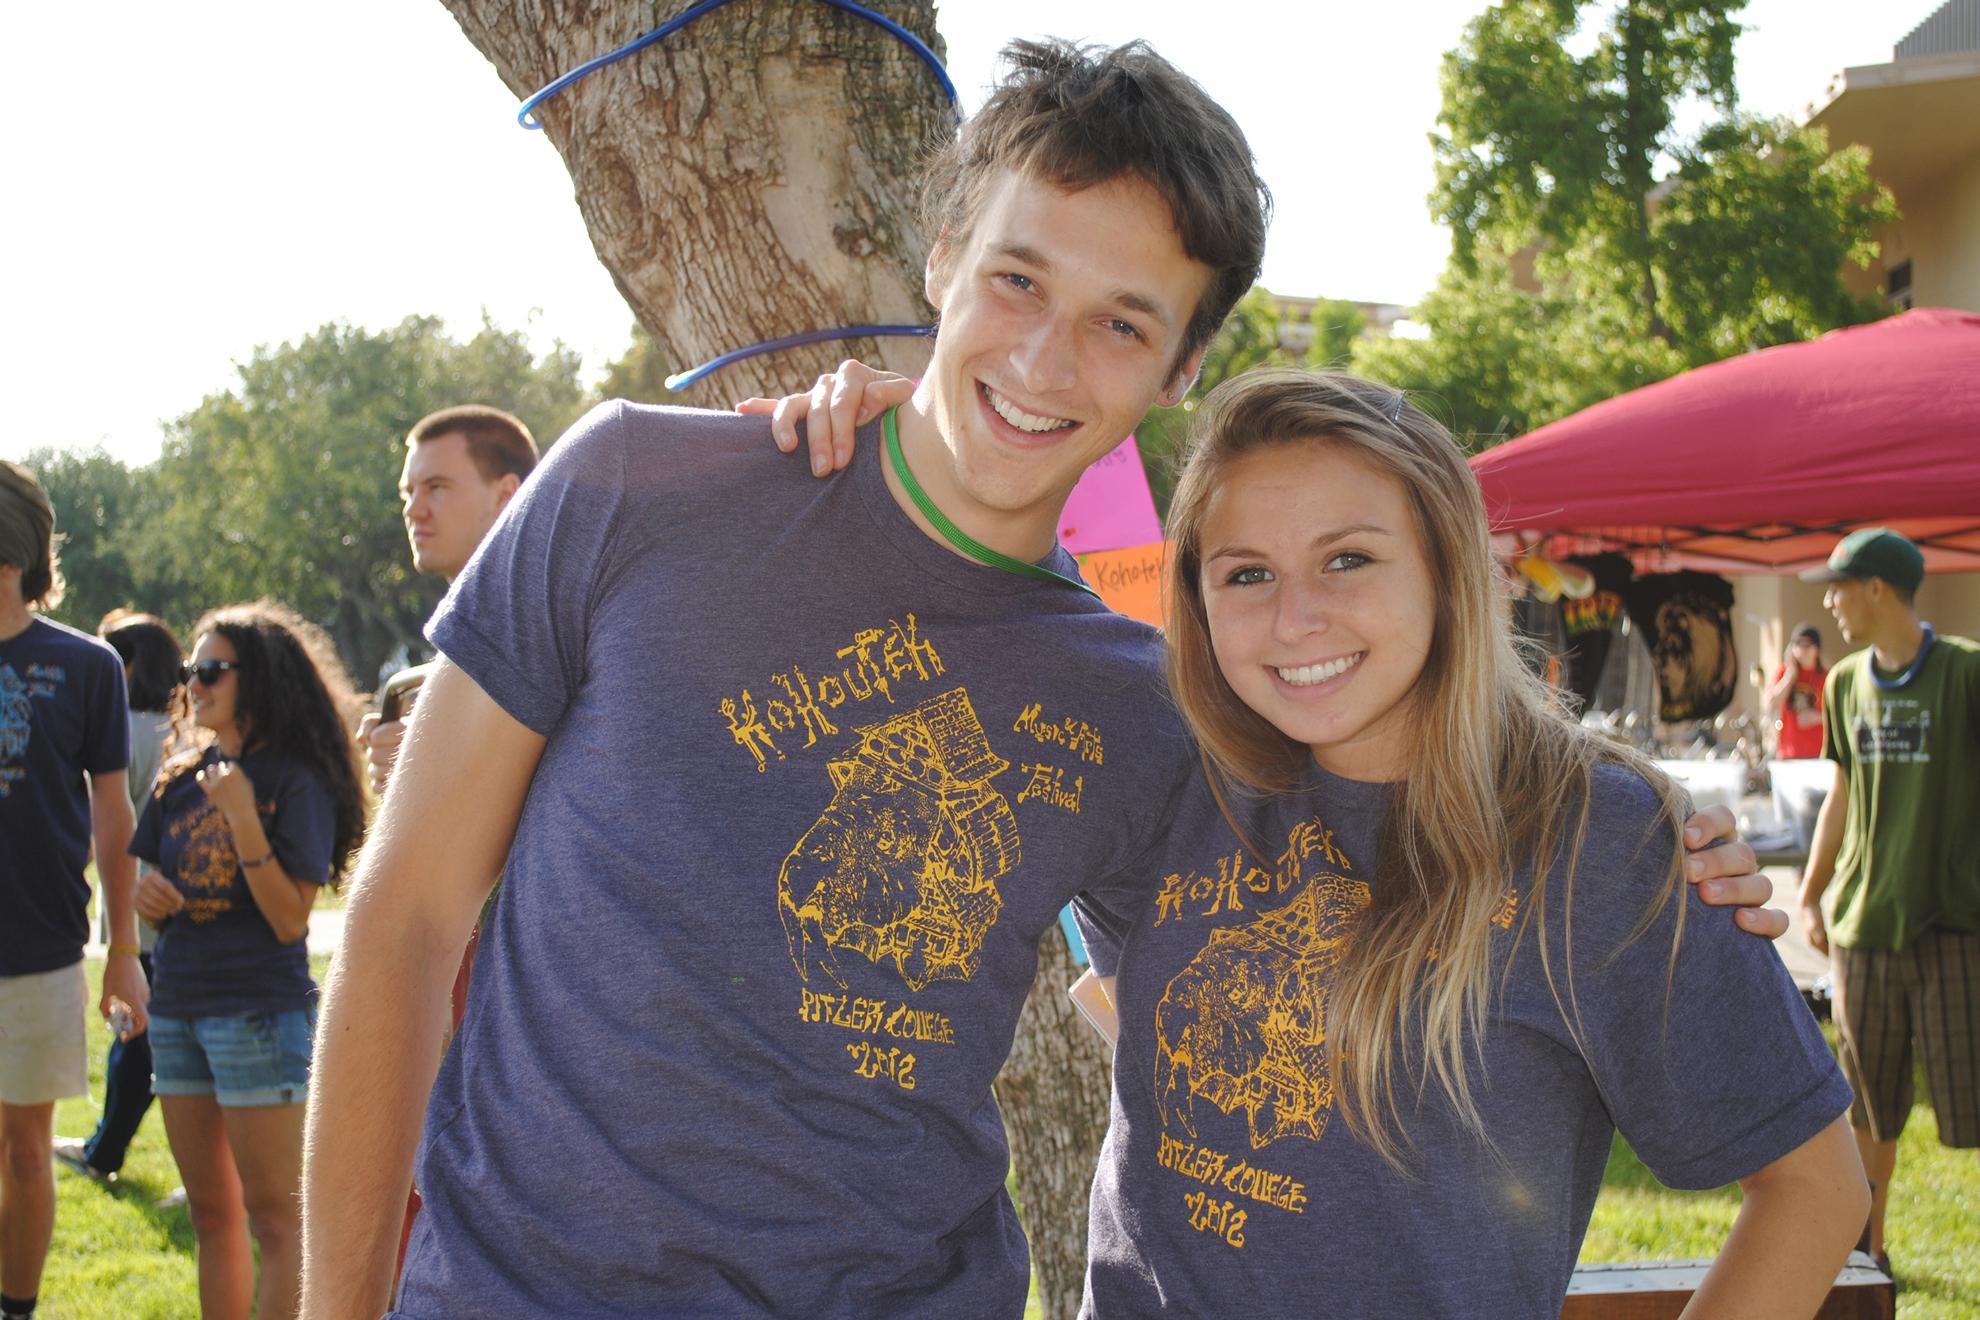 2012 - Students in Kohoutek t-shirts